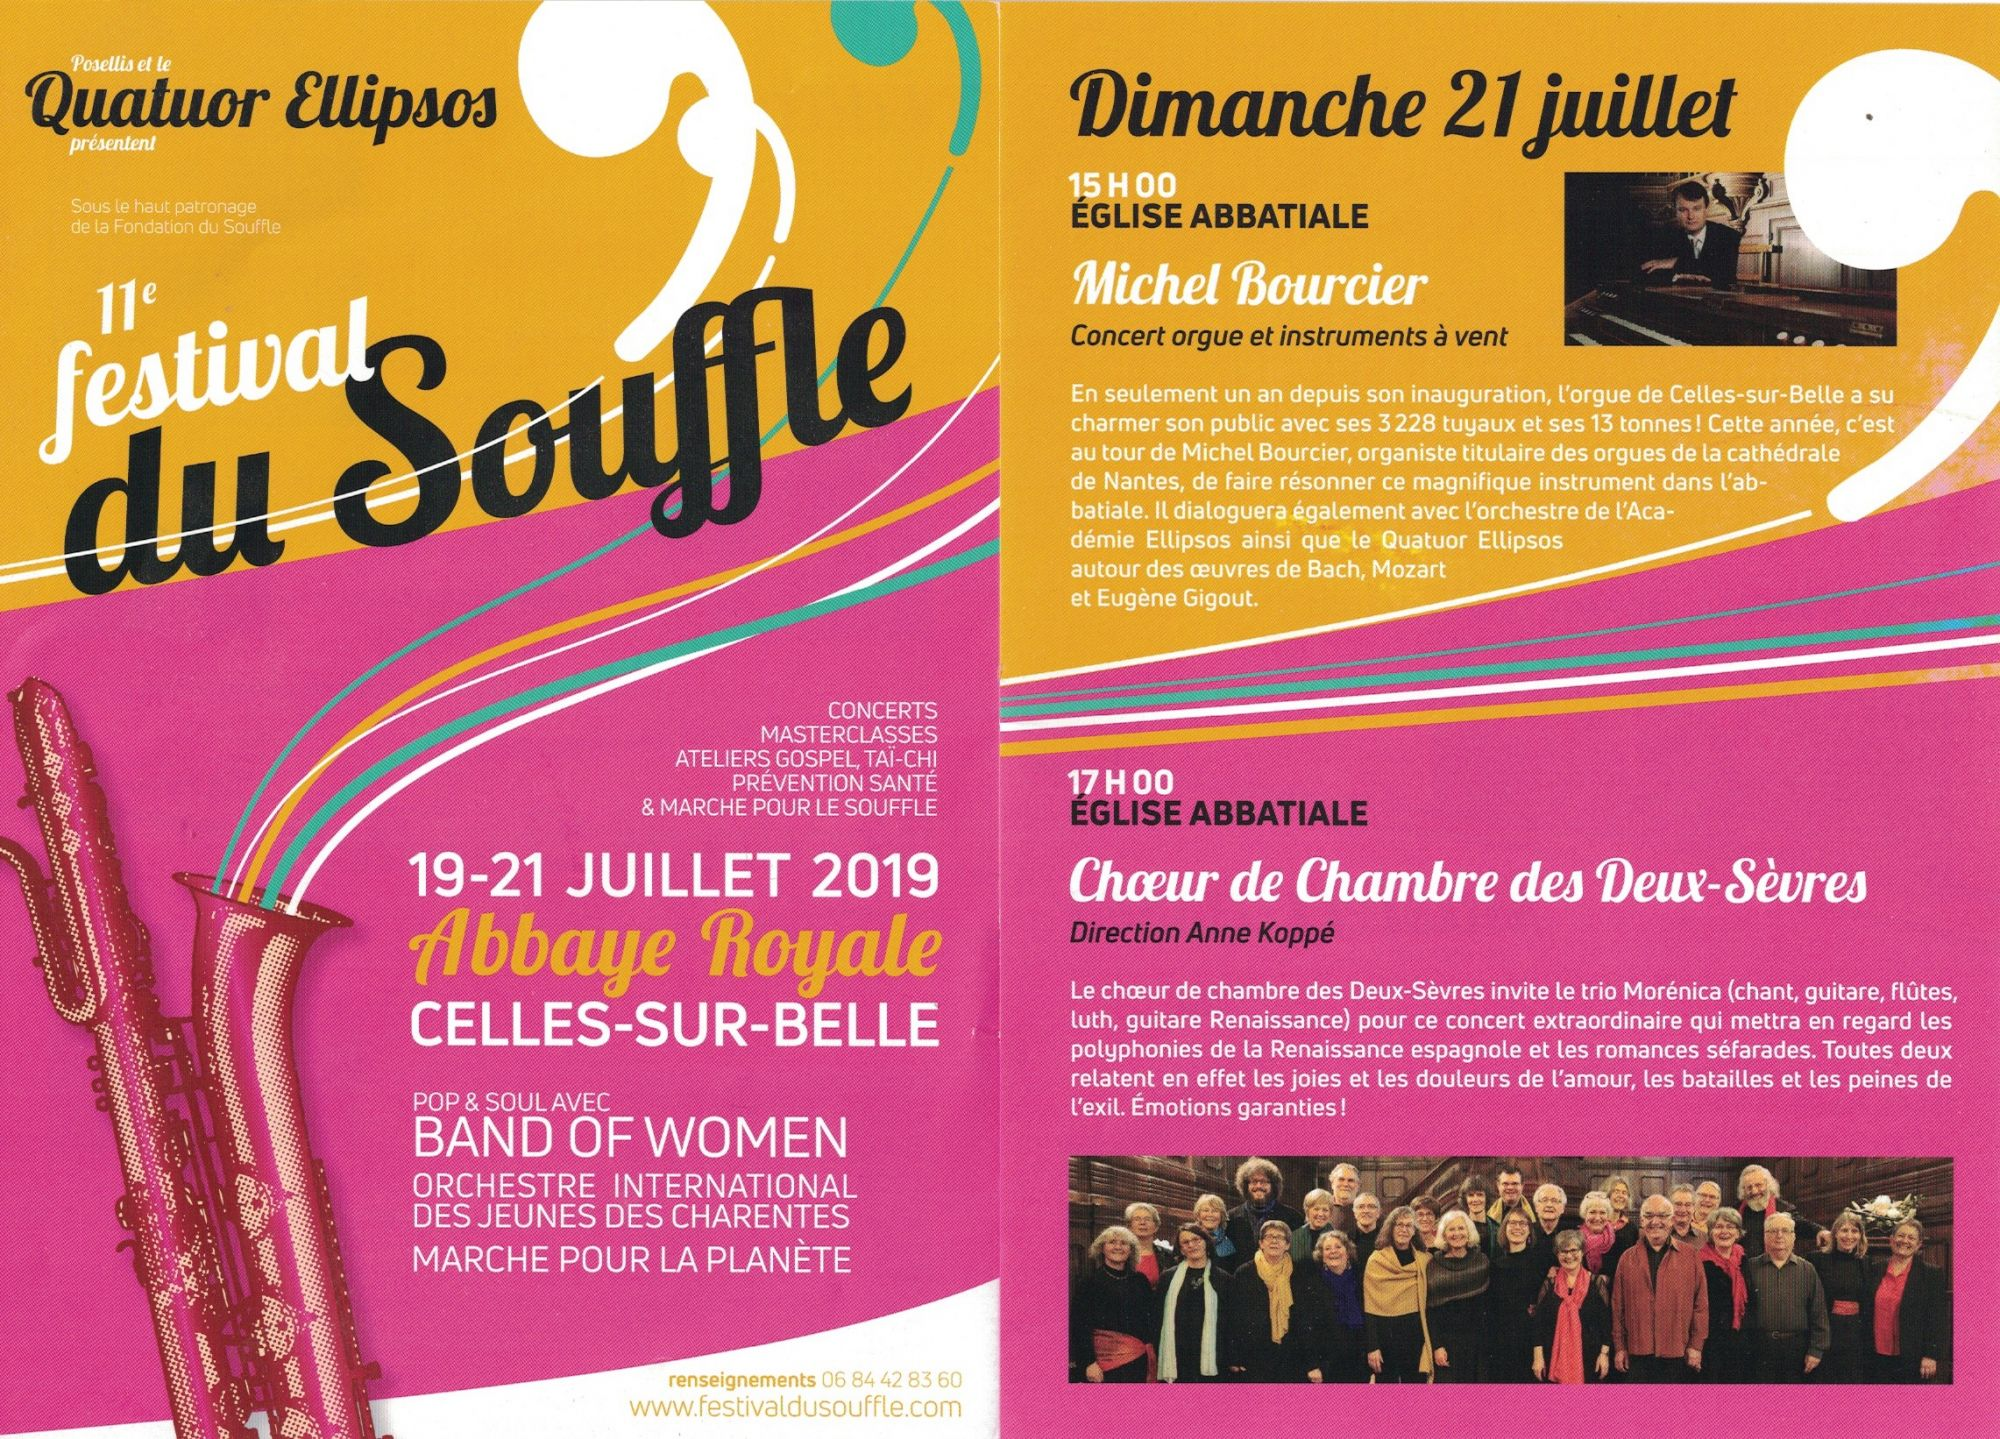 Festival du souffle 2019